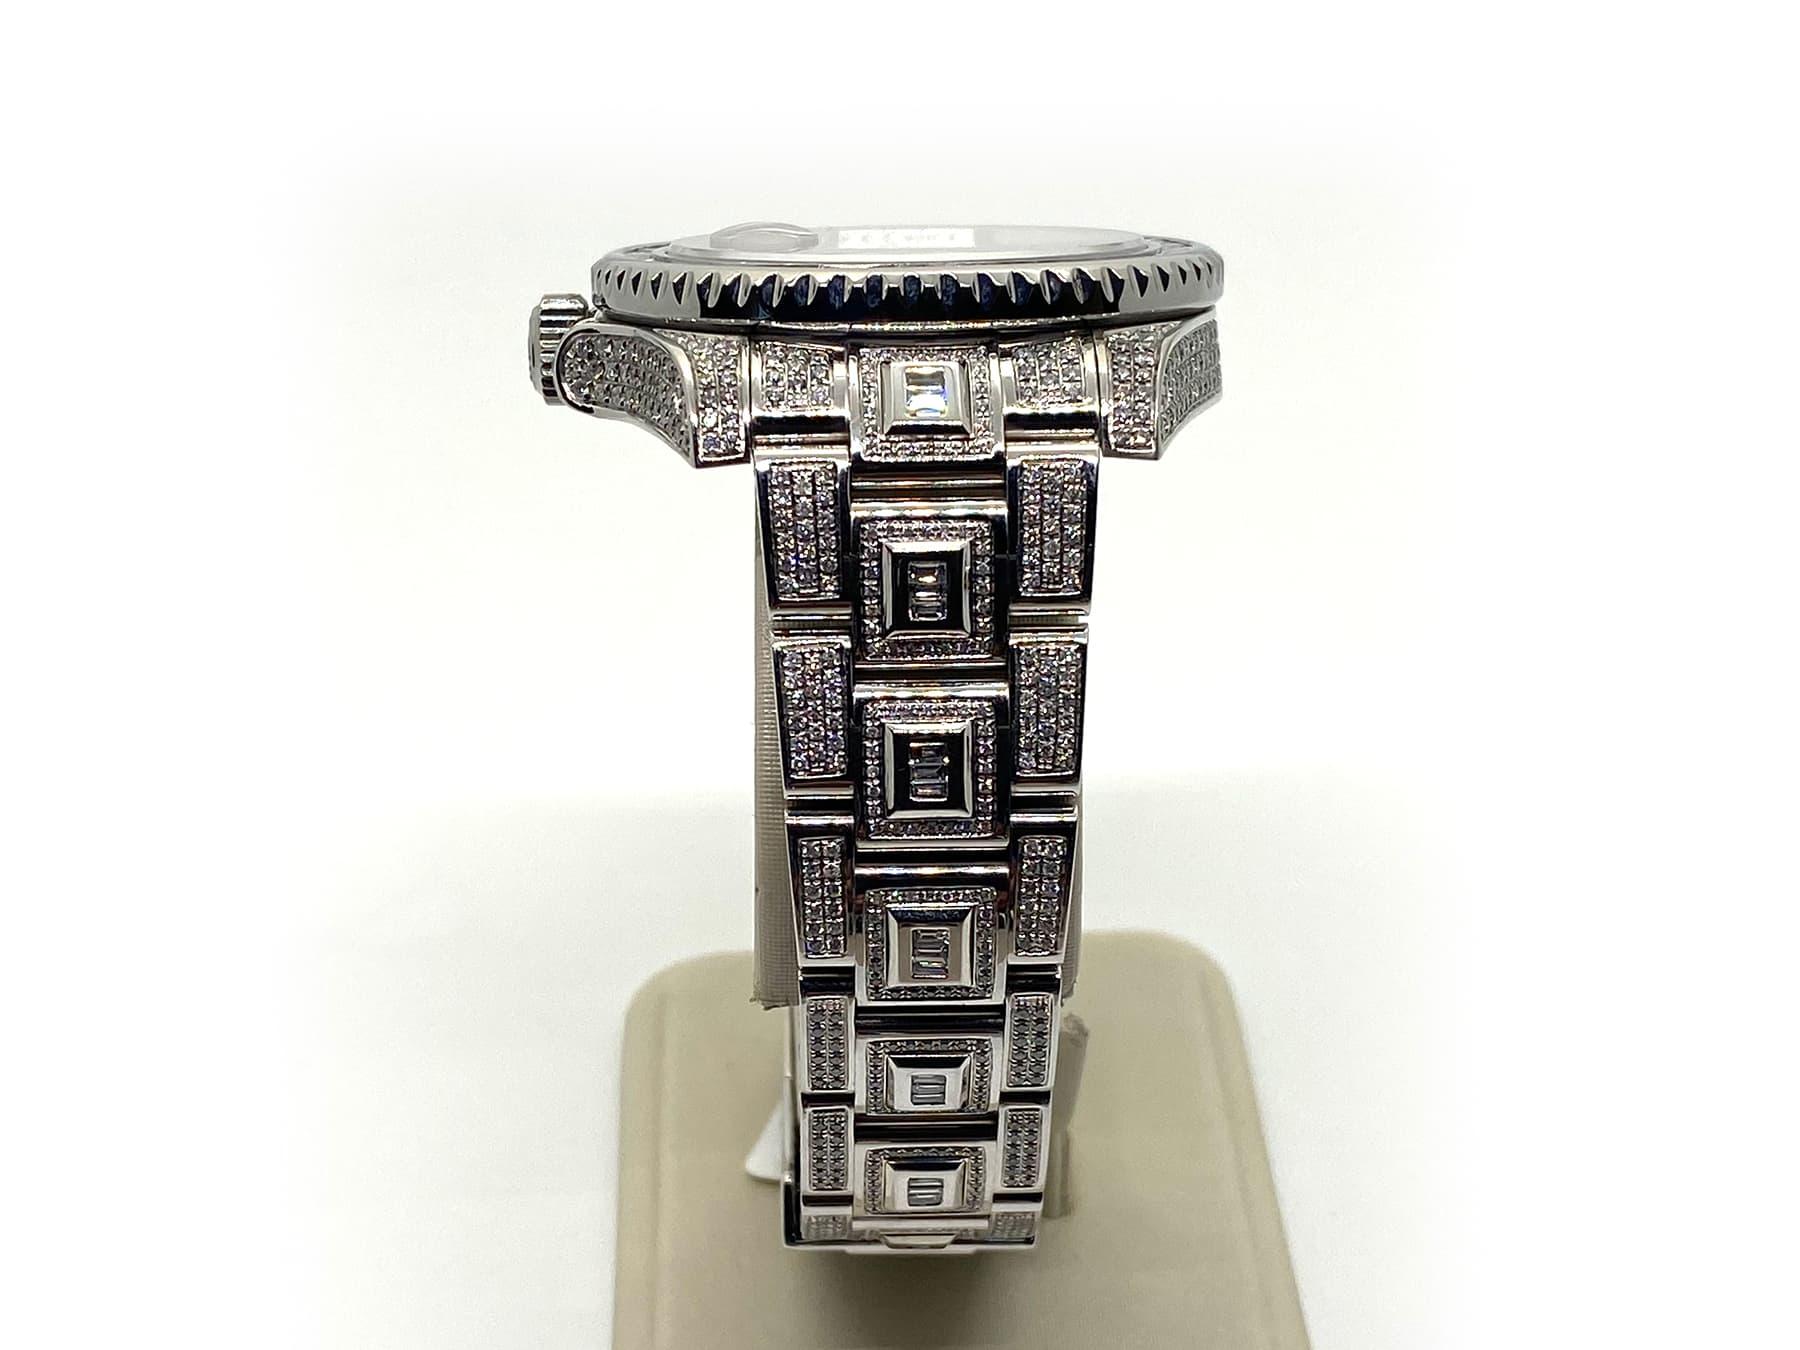 GMT Master II Men's Rolex Watch